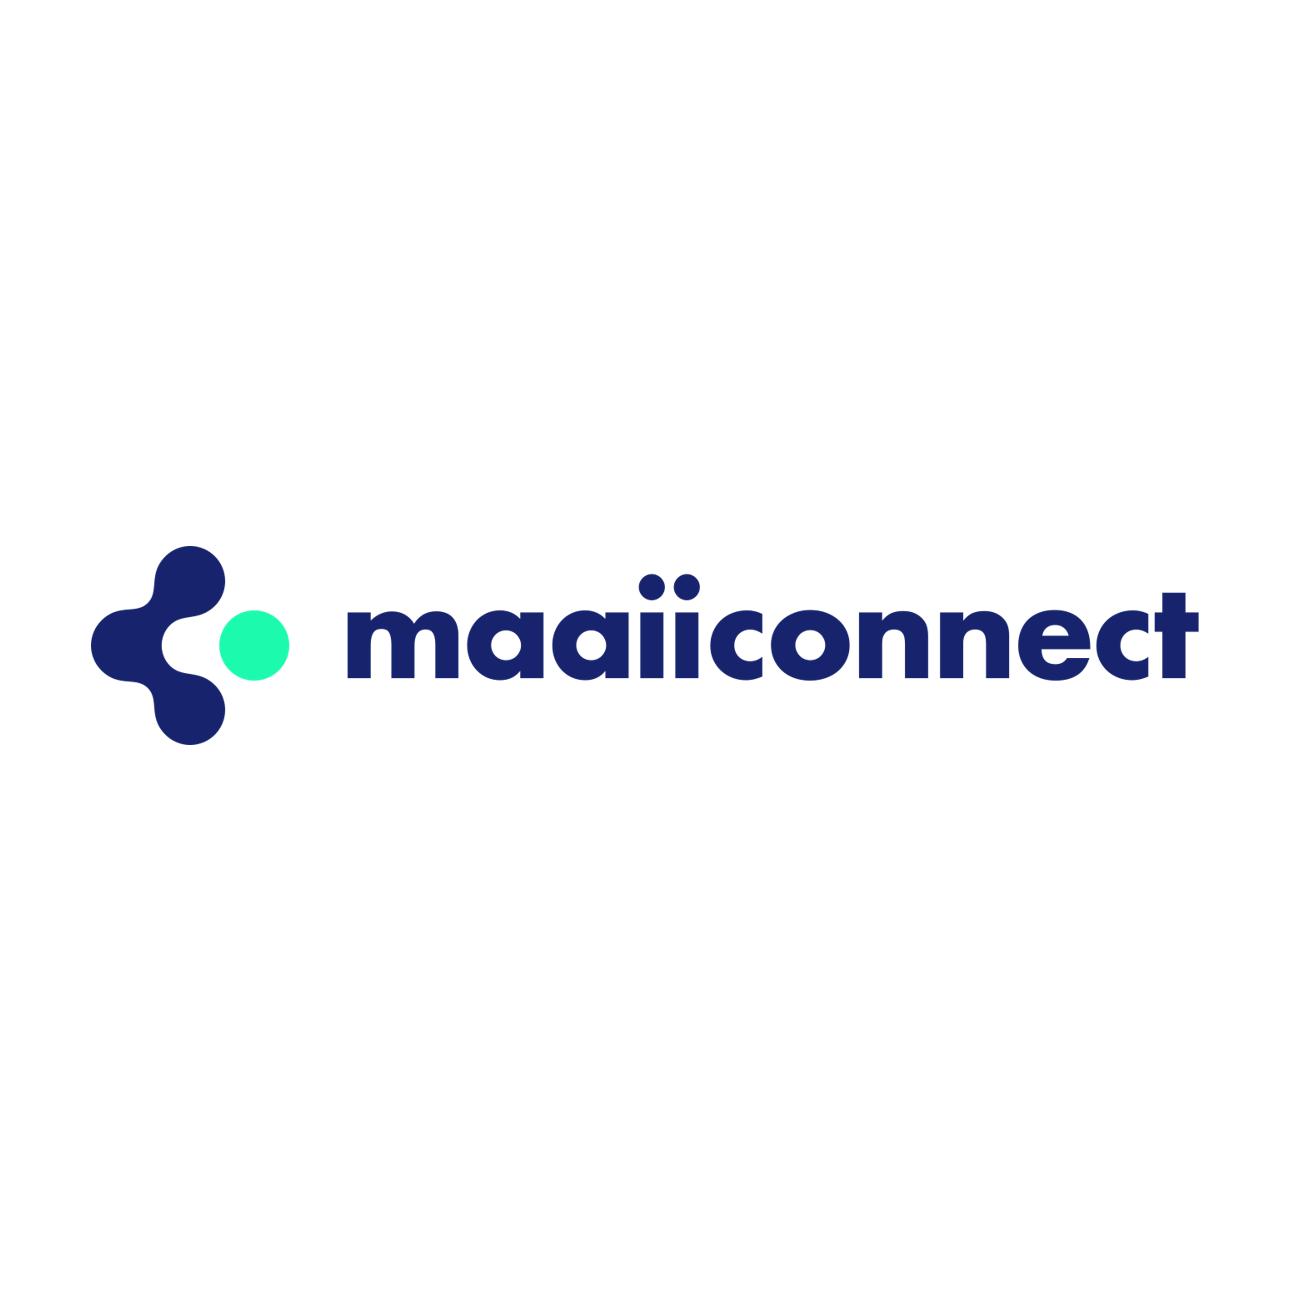 maaiiconnect-logo-sq.png